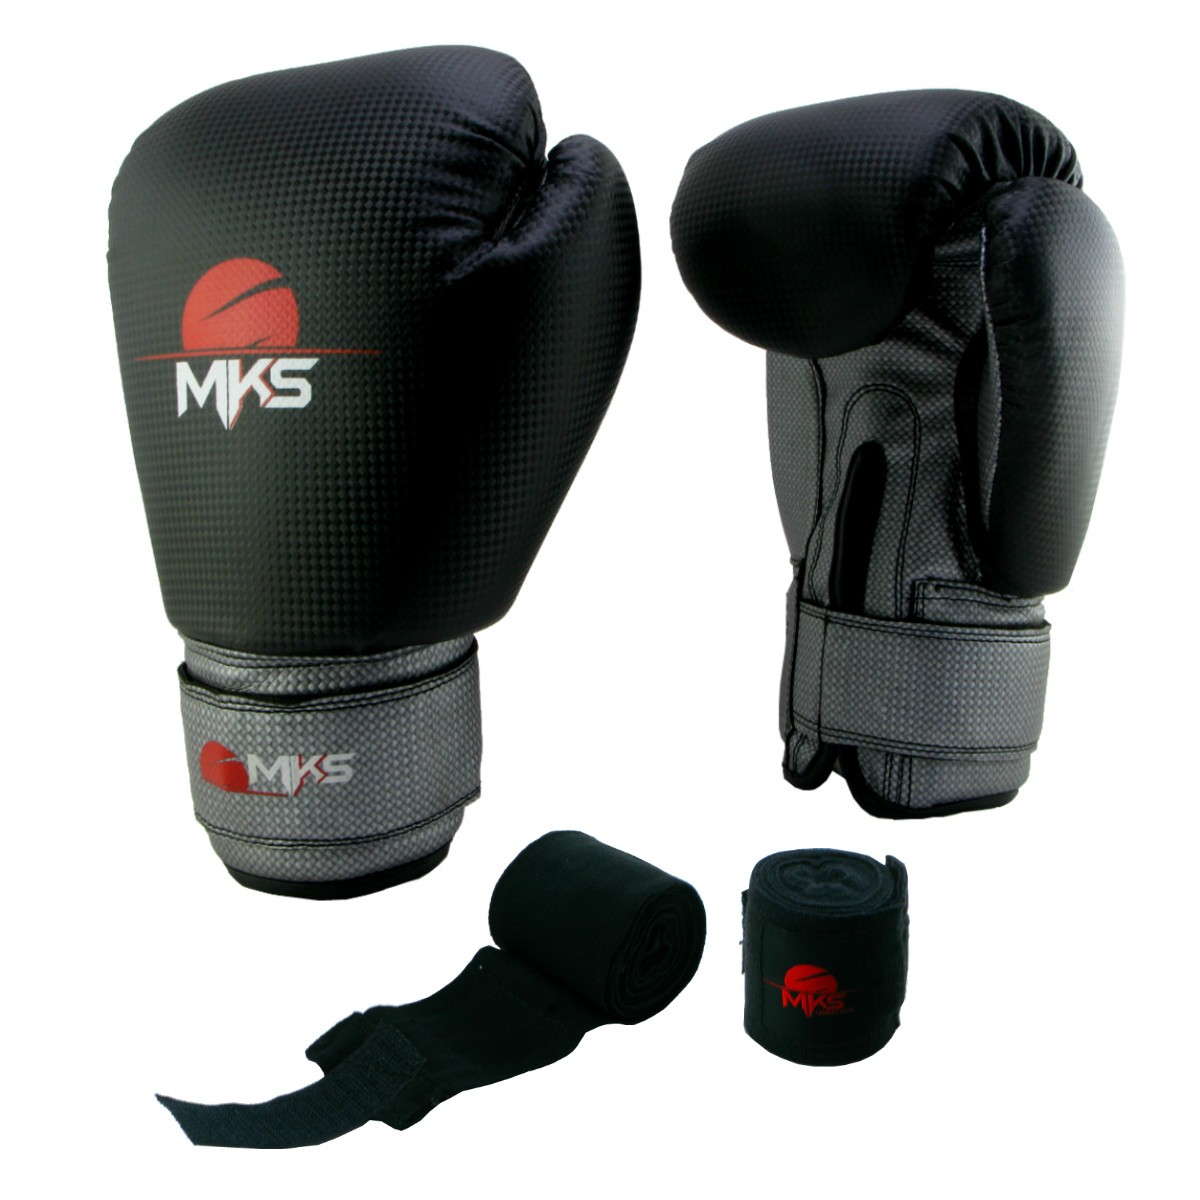 Luva de Boxe Prospect MKS Black & Silver 16 oz + bandagem